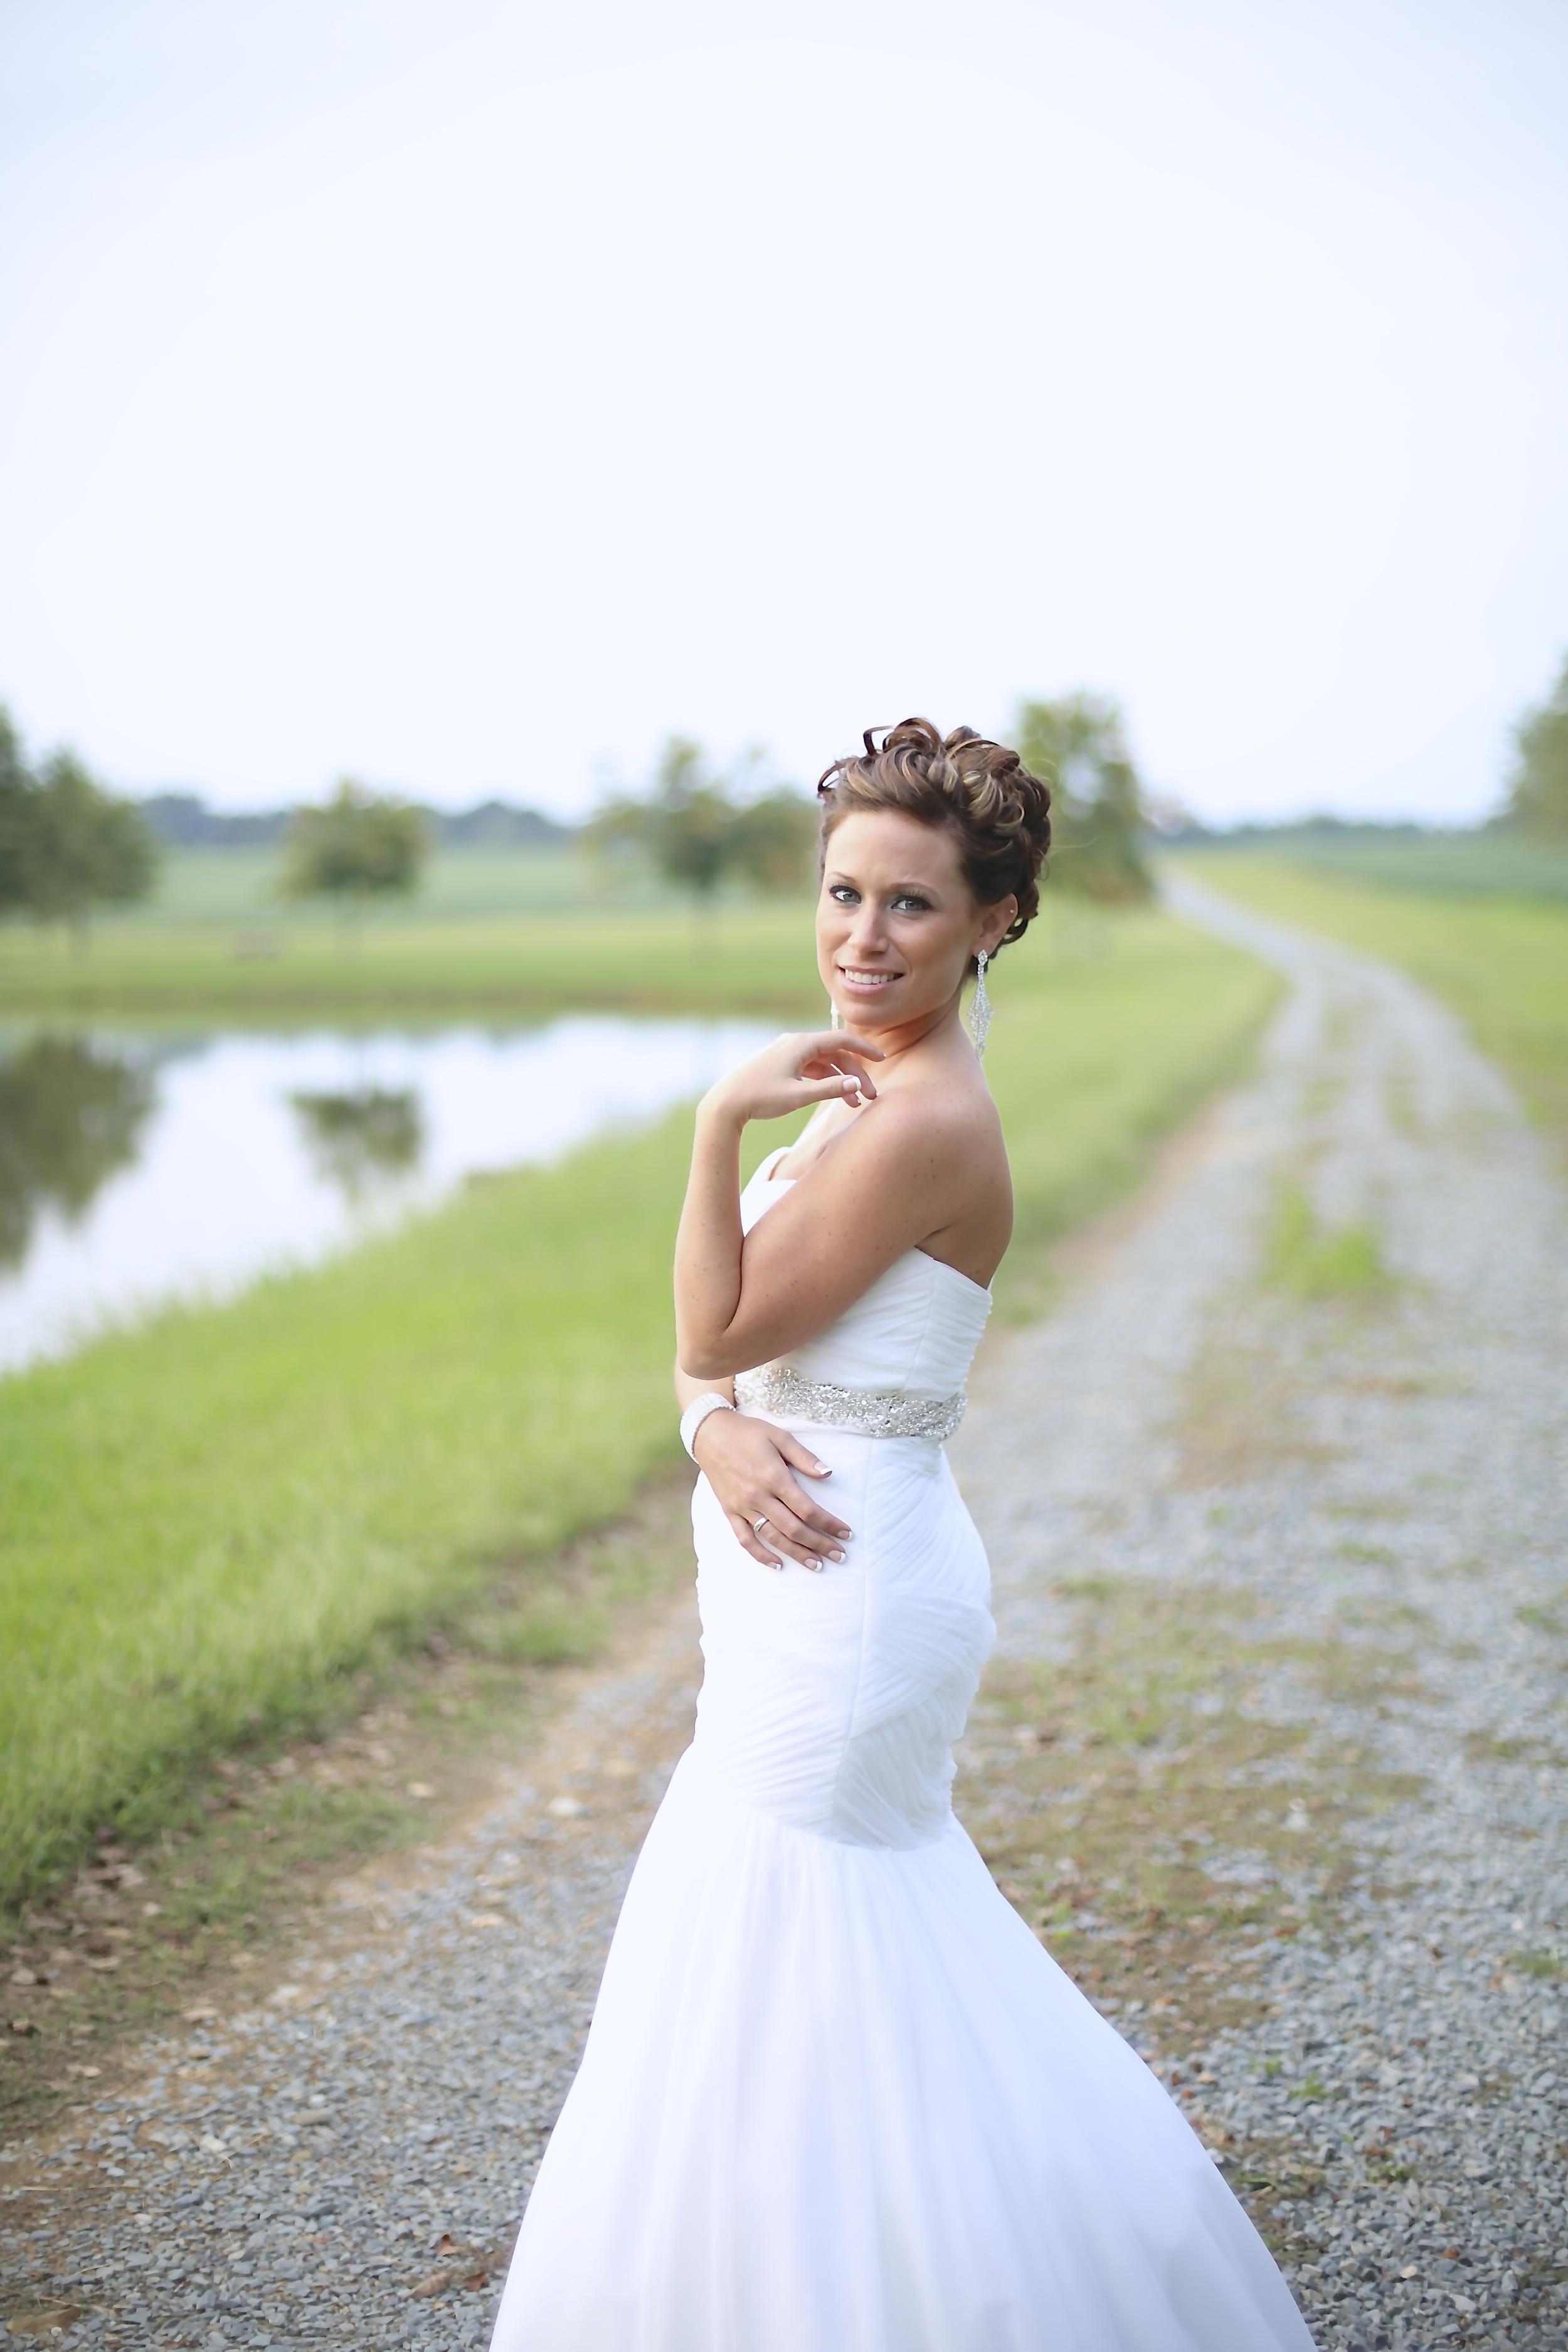 joanna bridal shoot 3